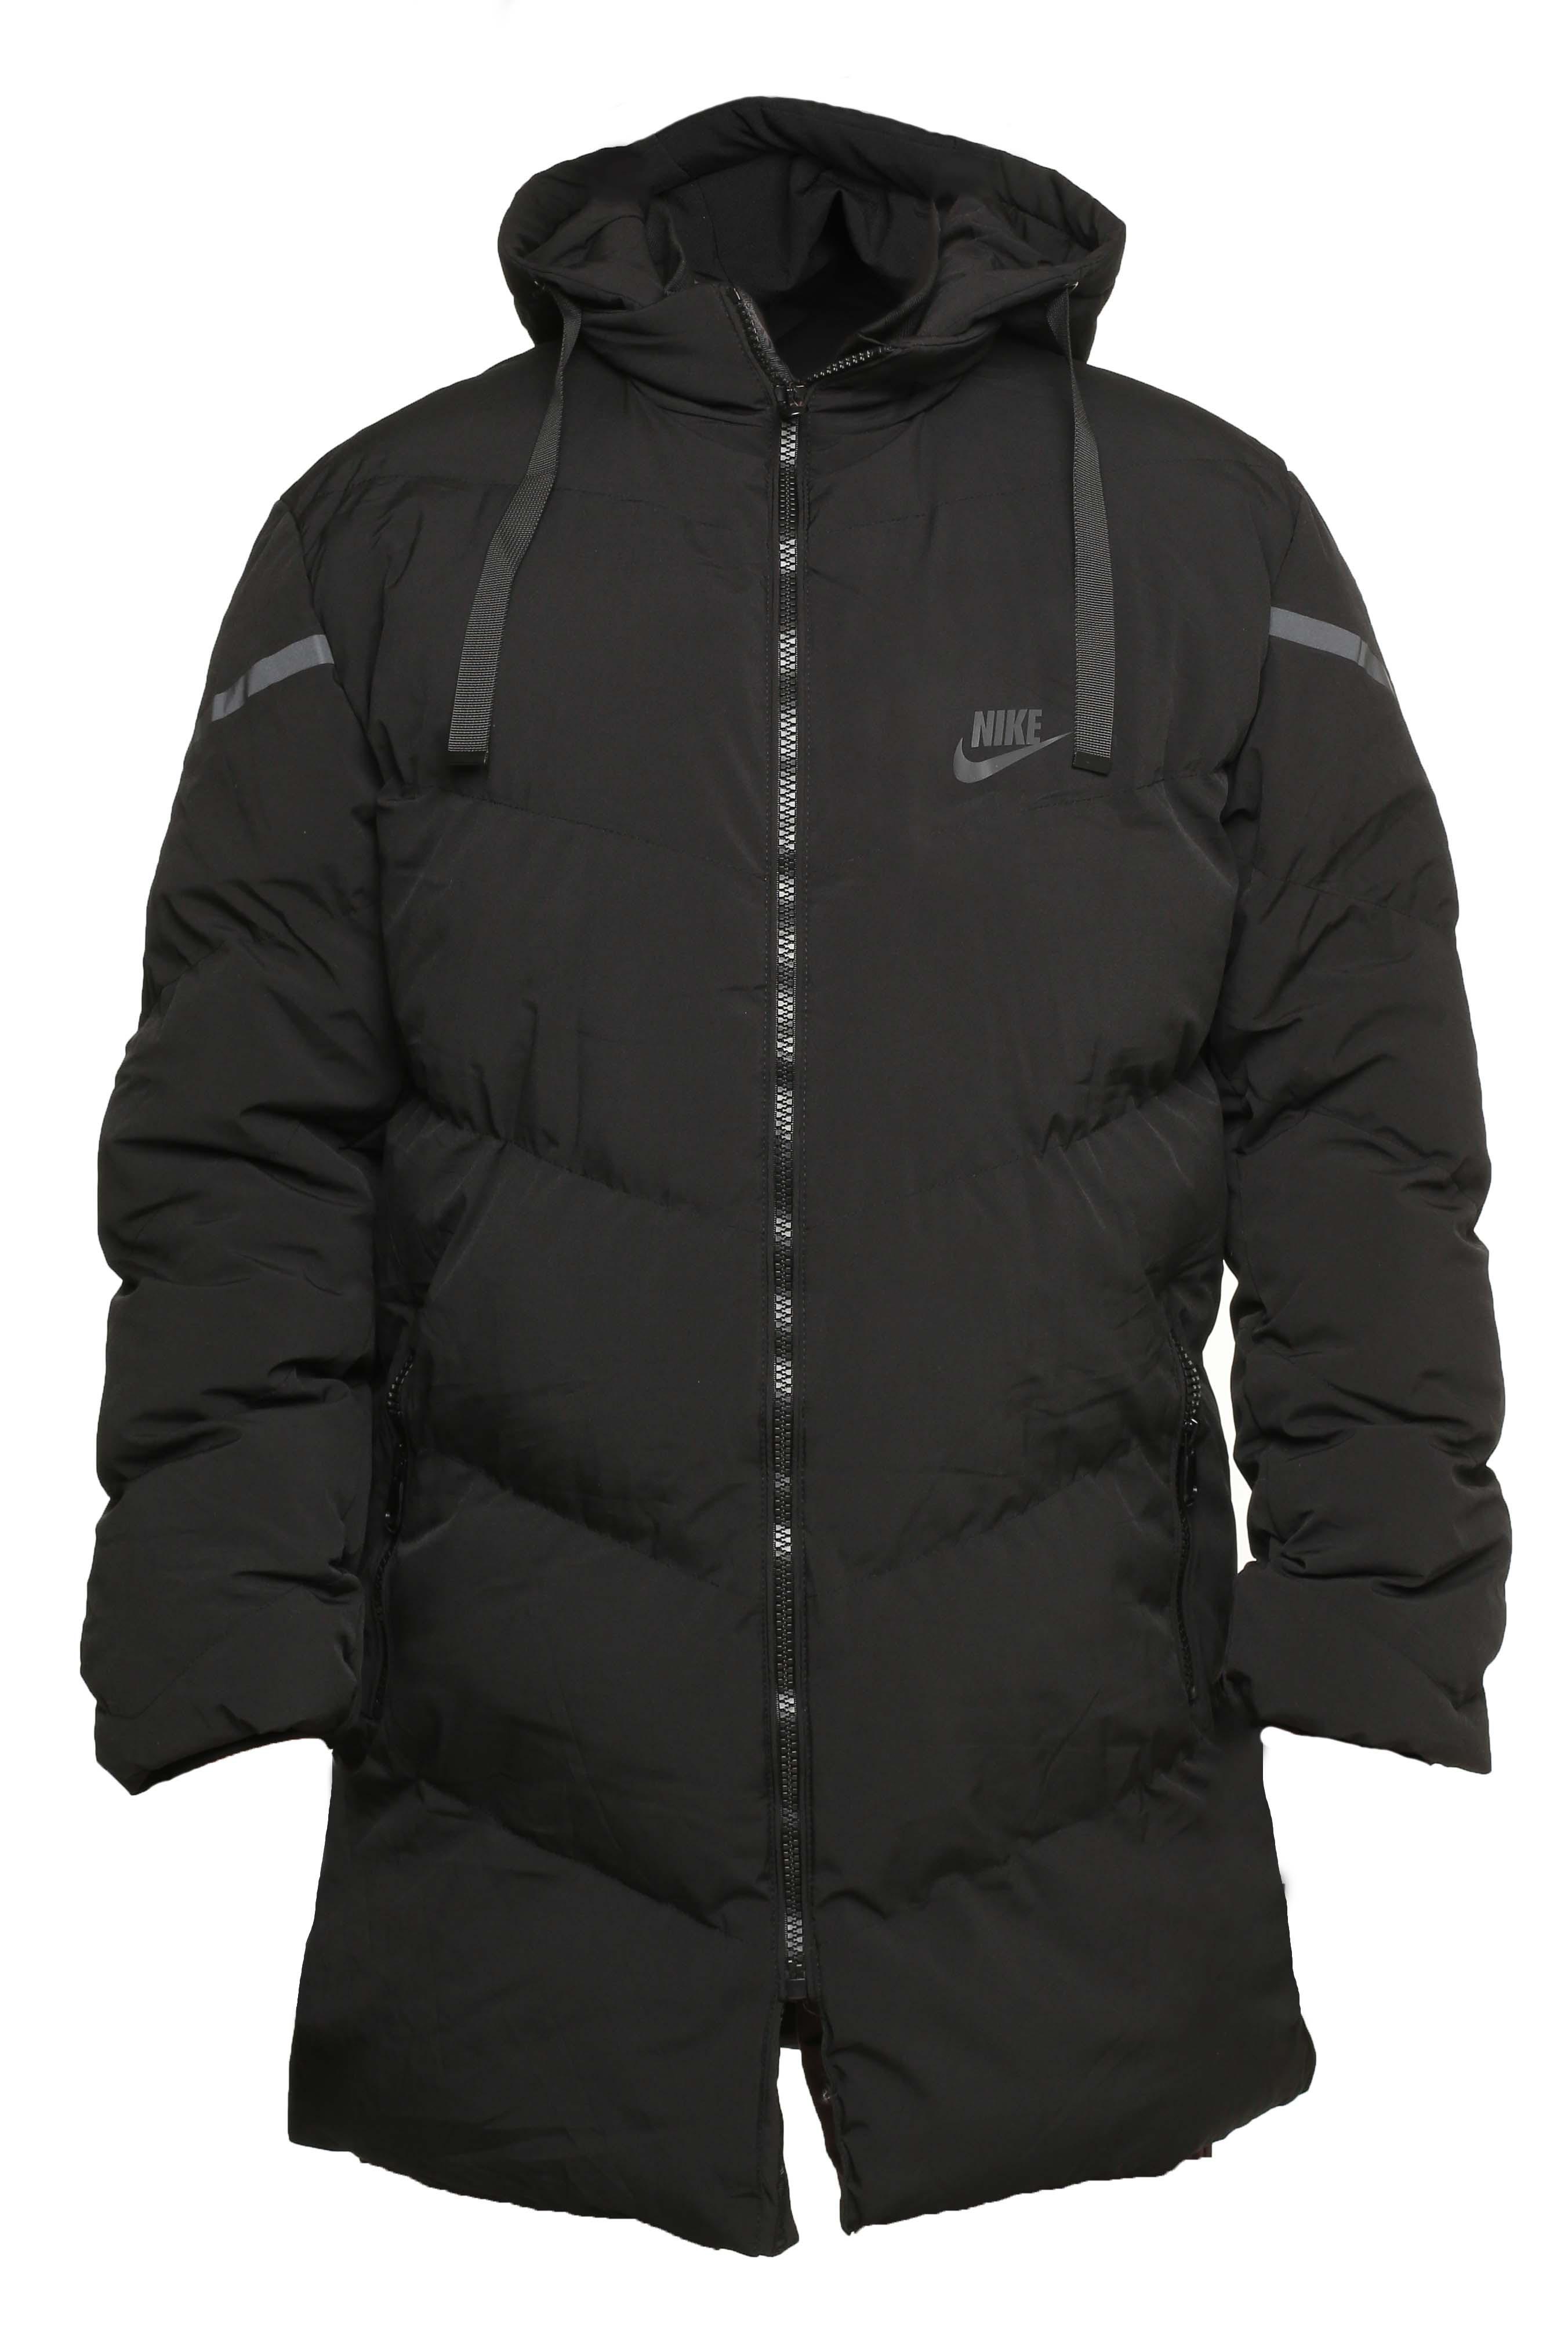 Зимняя куртка nike down fill black black 5566